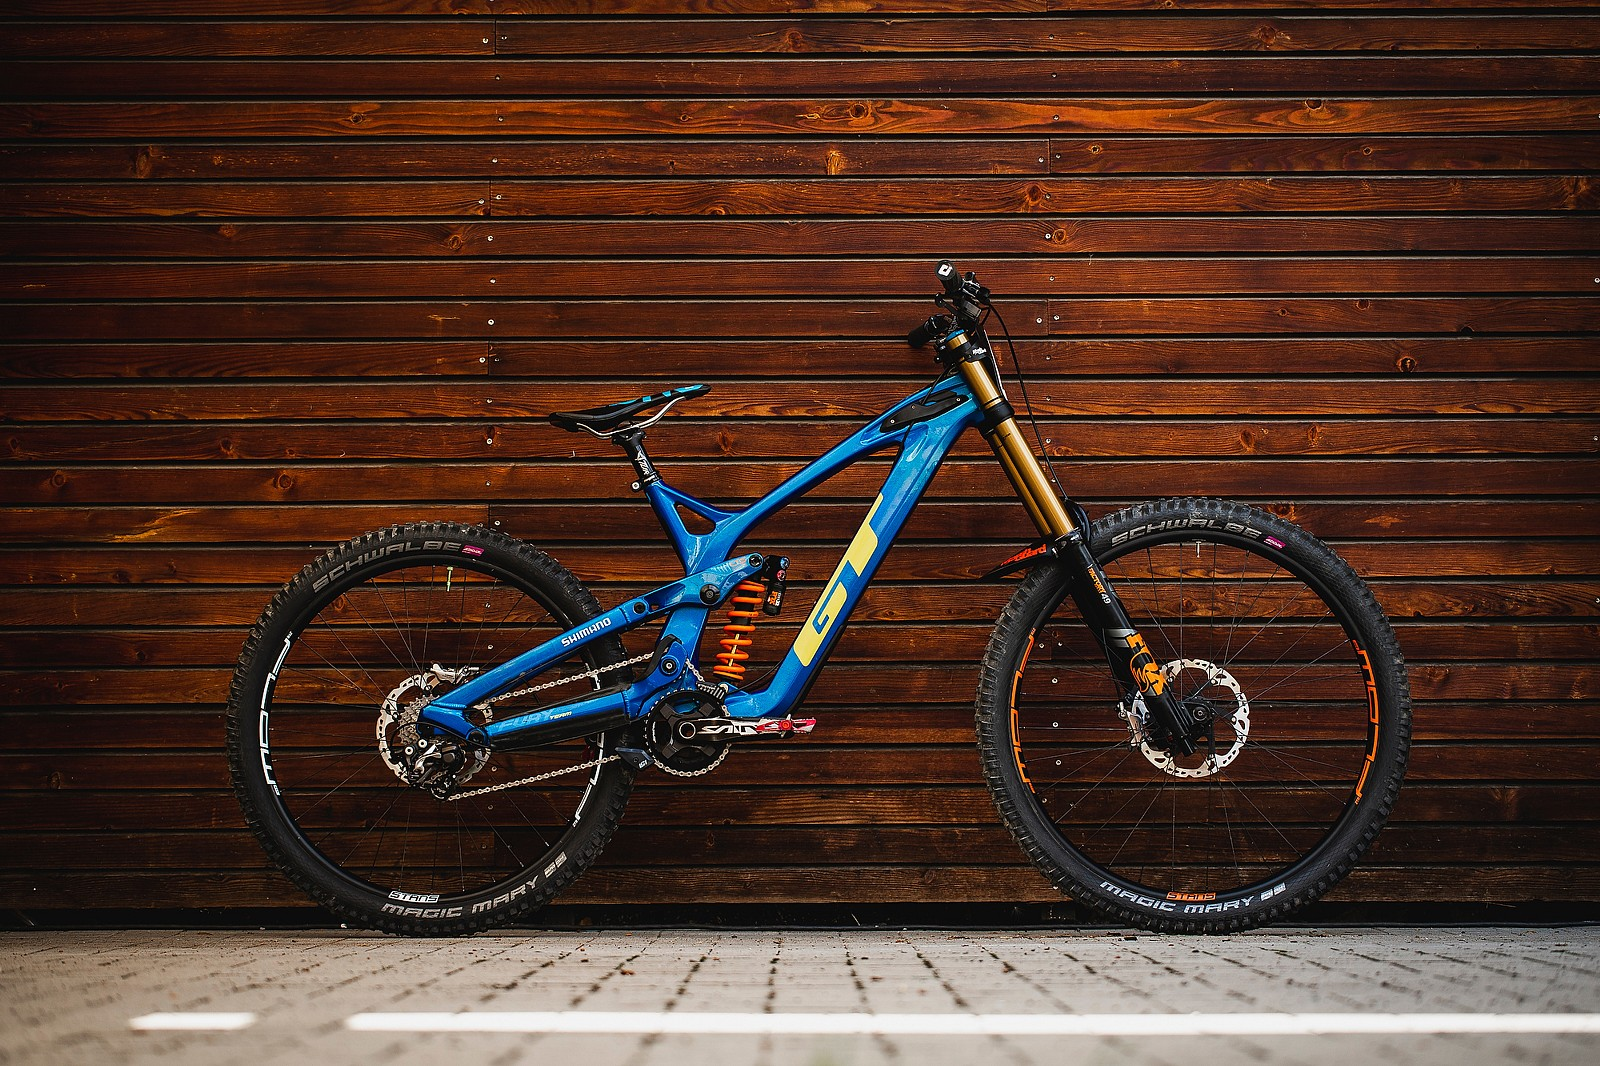 Pro Bike Check - George Brannigan's GT Fury - Pro Bike Check - George Brannigan's GT Fury - Mountain Biking Pictures - Vital MTB